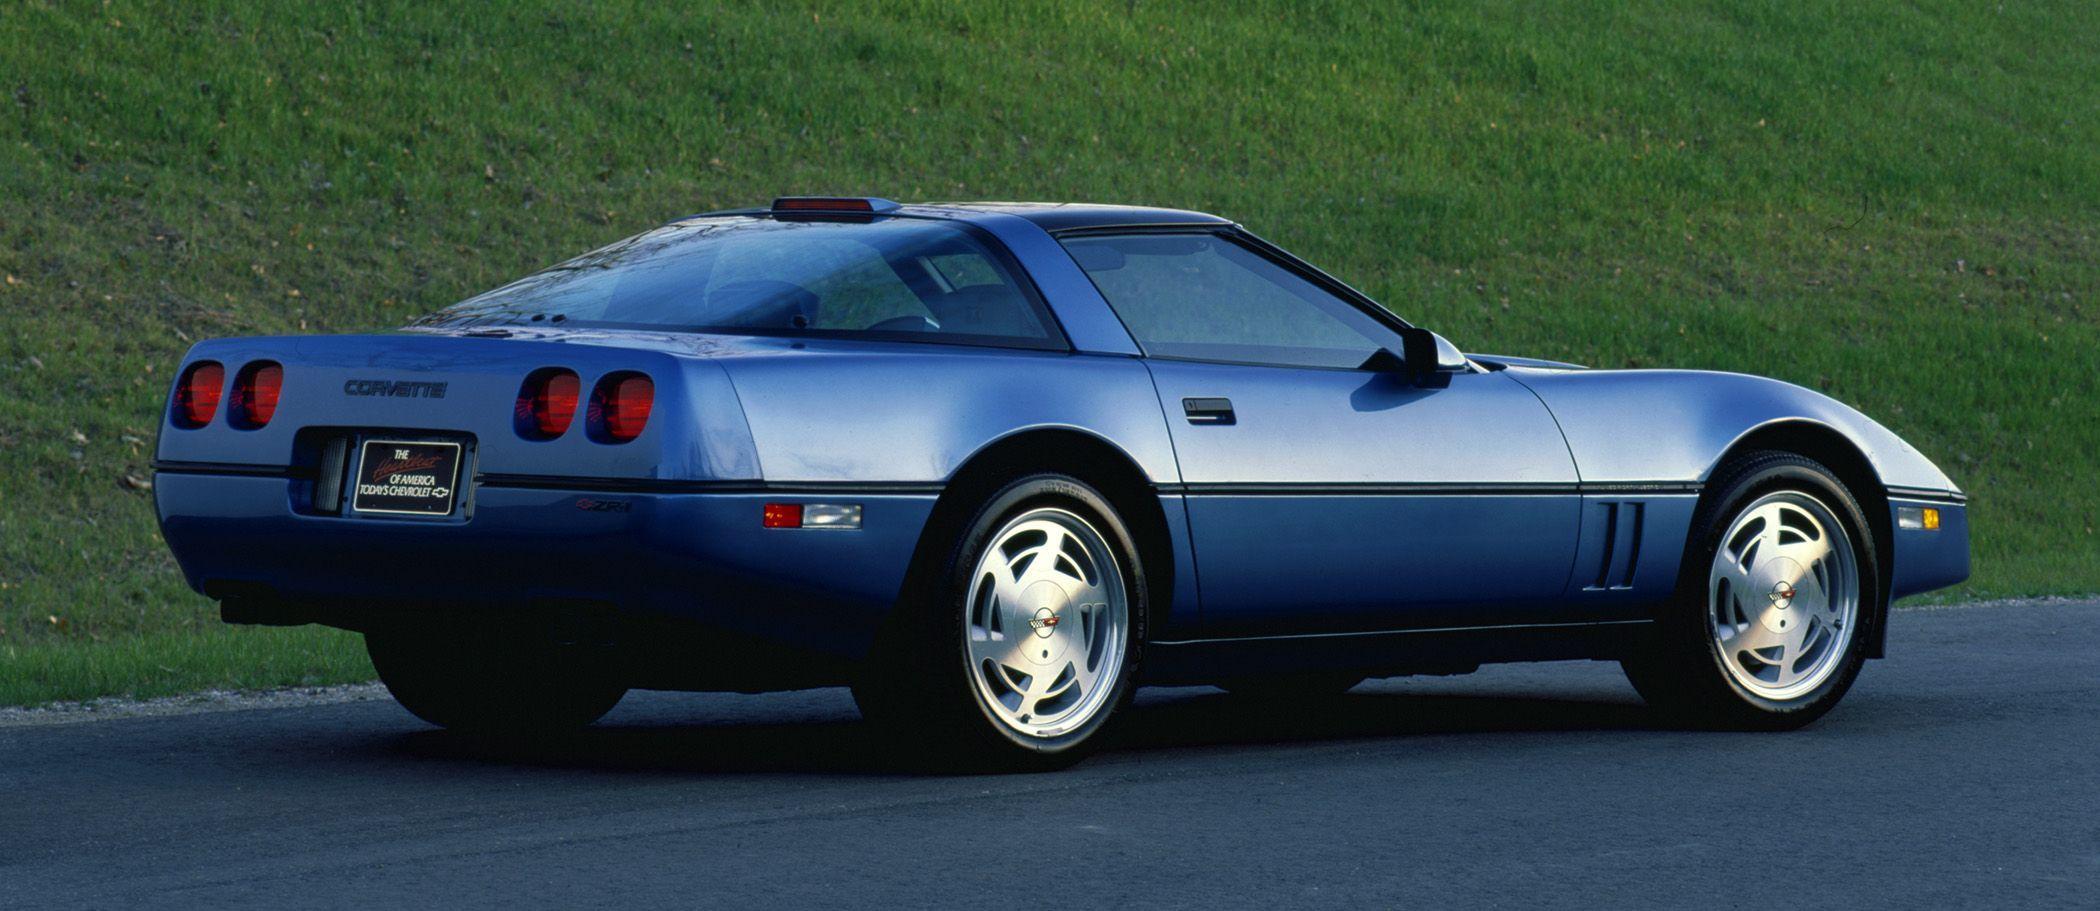 Kekurangan Corvette 1990 Spesifikasi